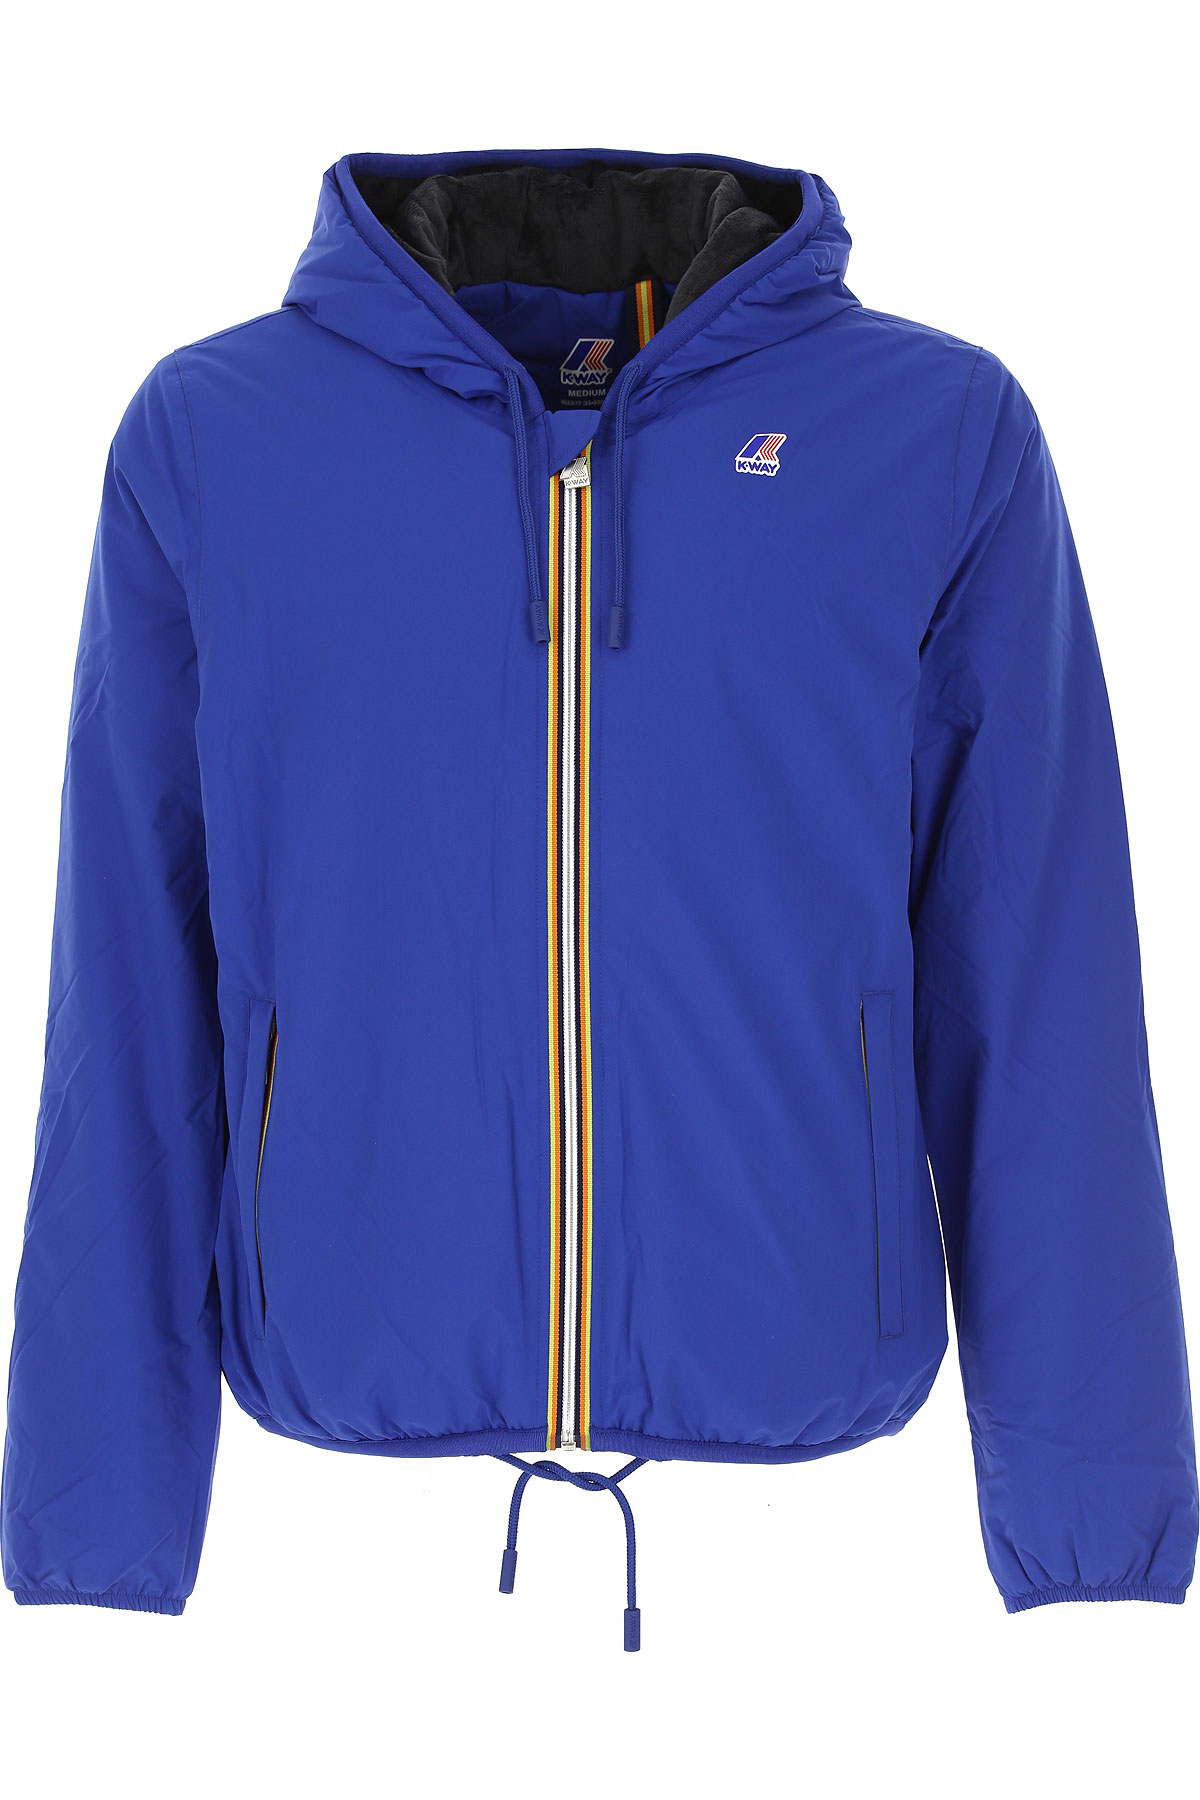 K-Way Down Jacket for Men, Puffer Ski Jacket On Sale, Electric Blue, polyamide, 2019, L M S XXL